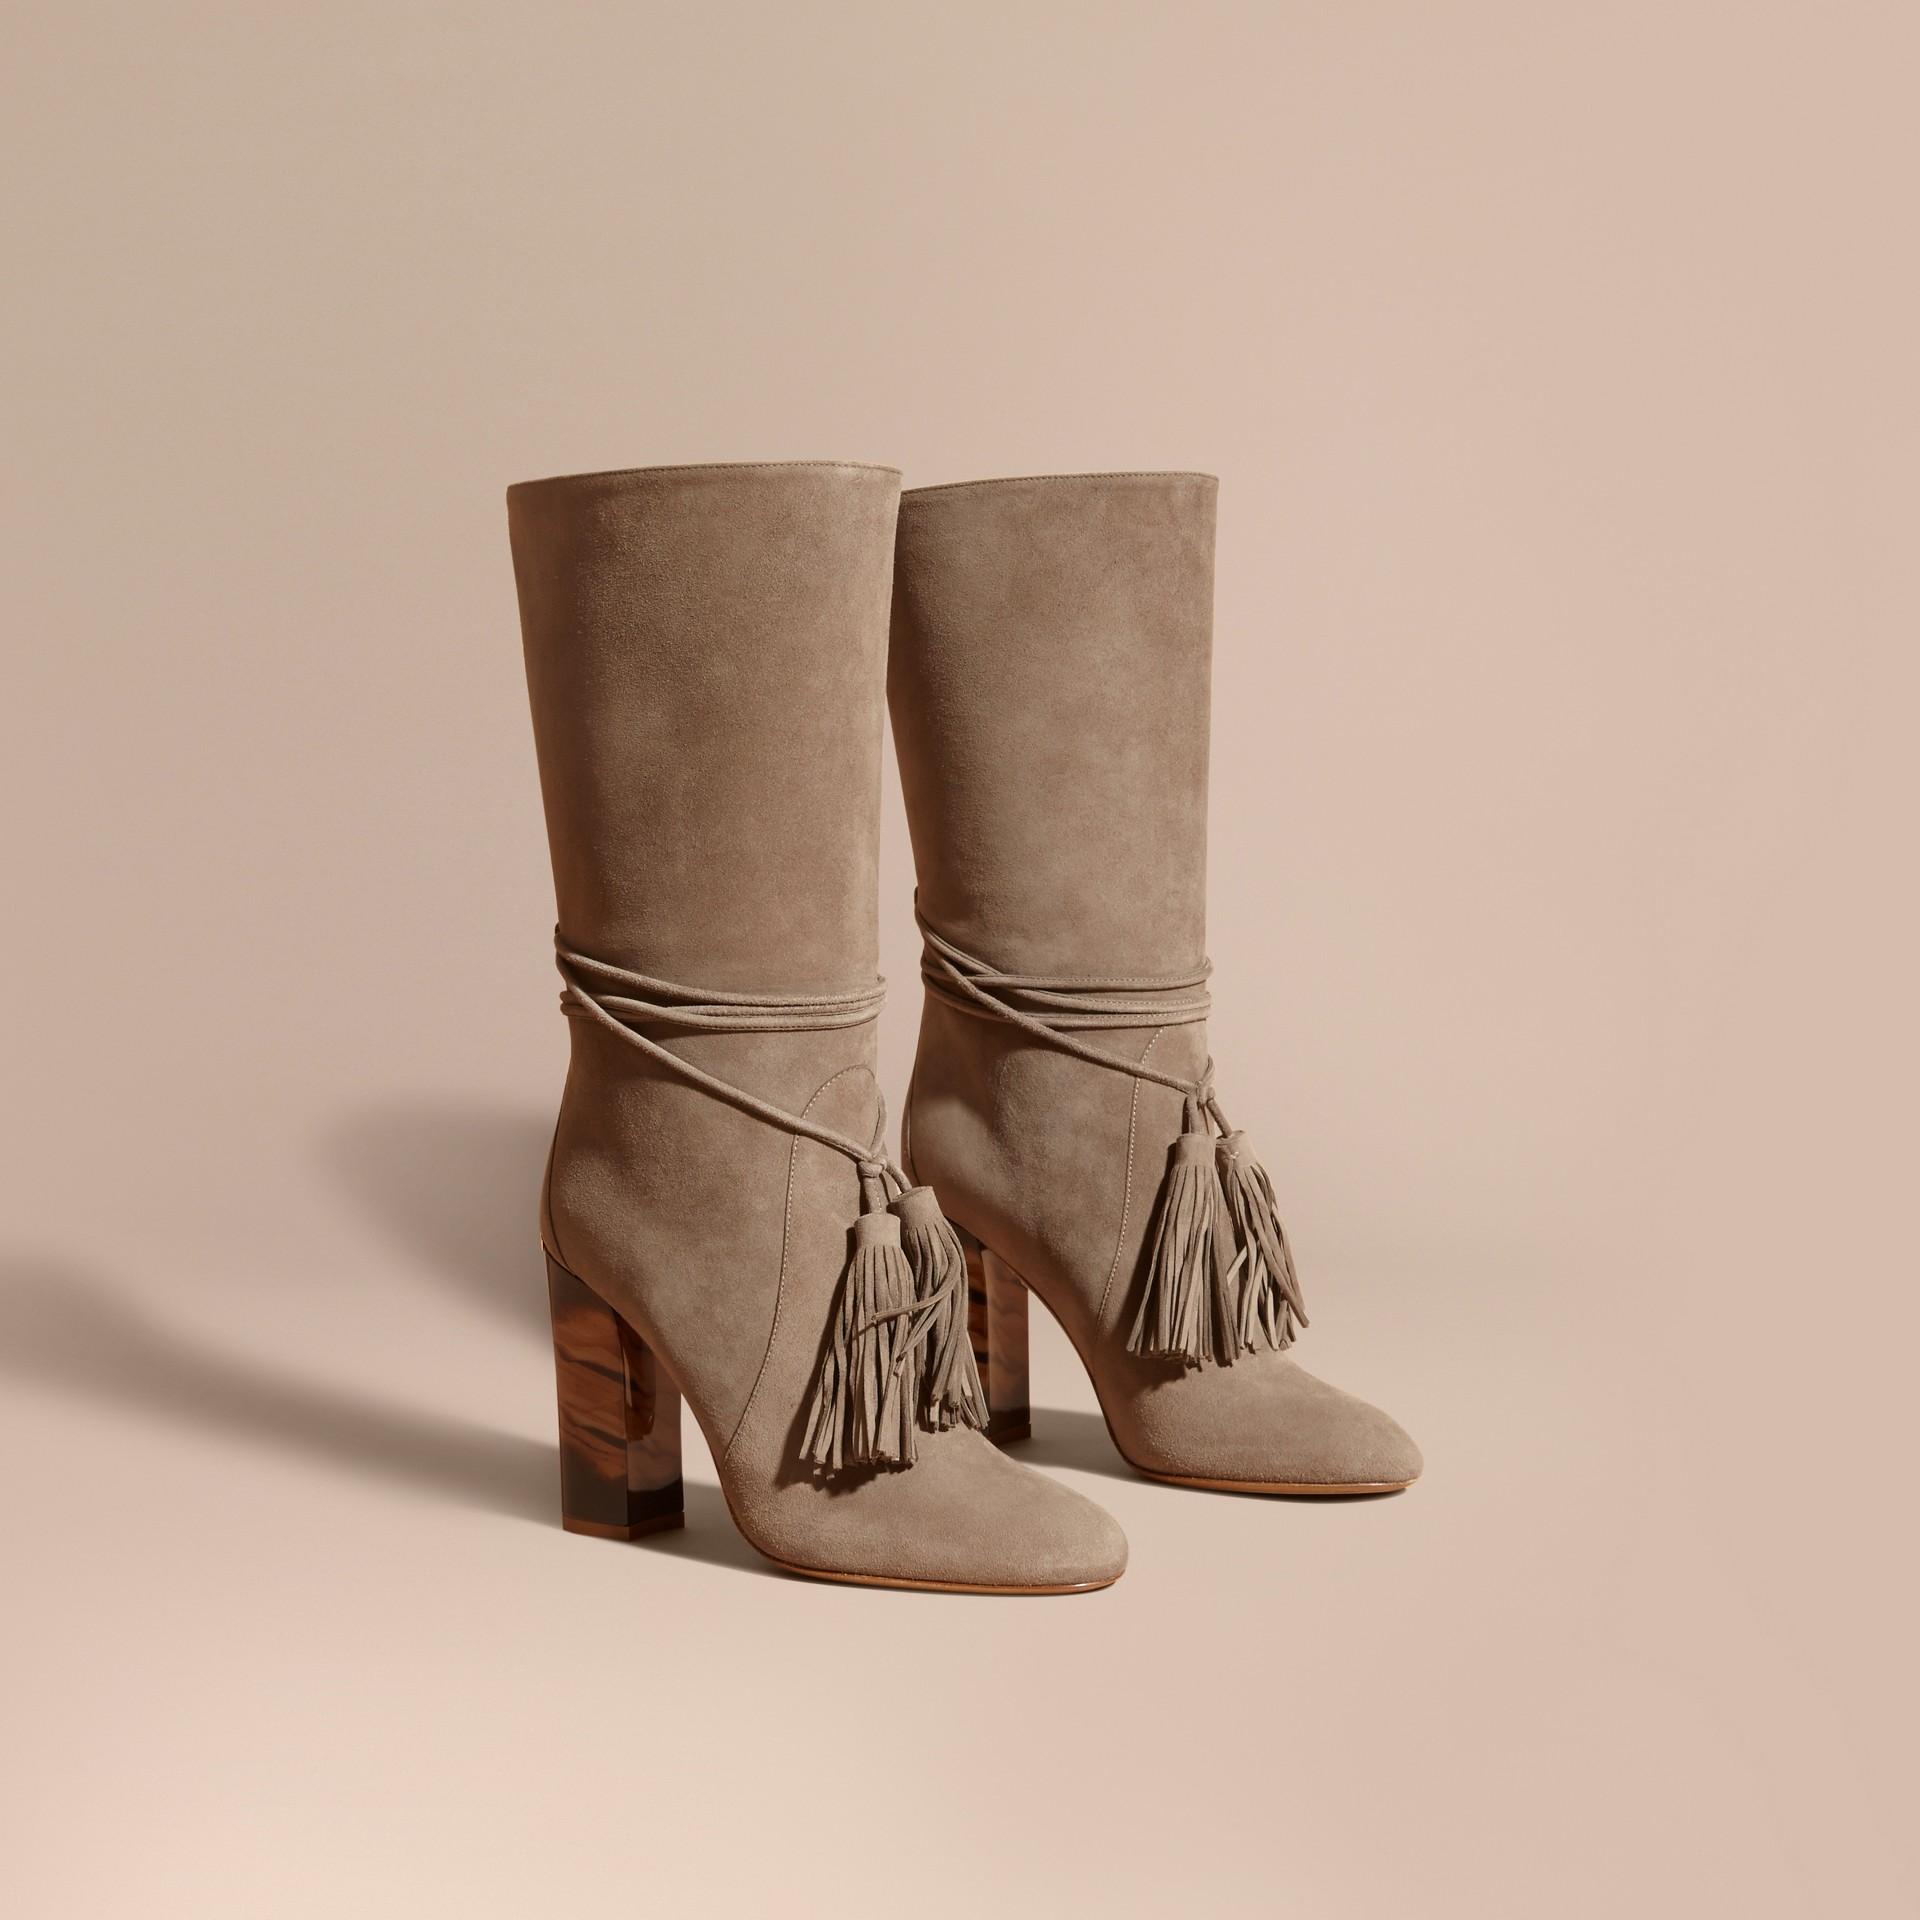 Dark heather melange Tasselled Suede Pull-on Boots - gallery image 1